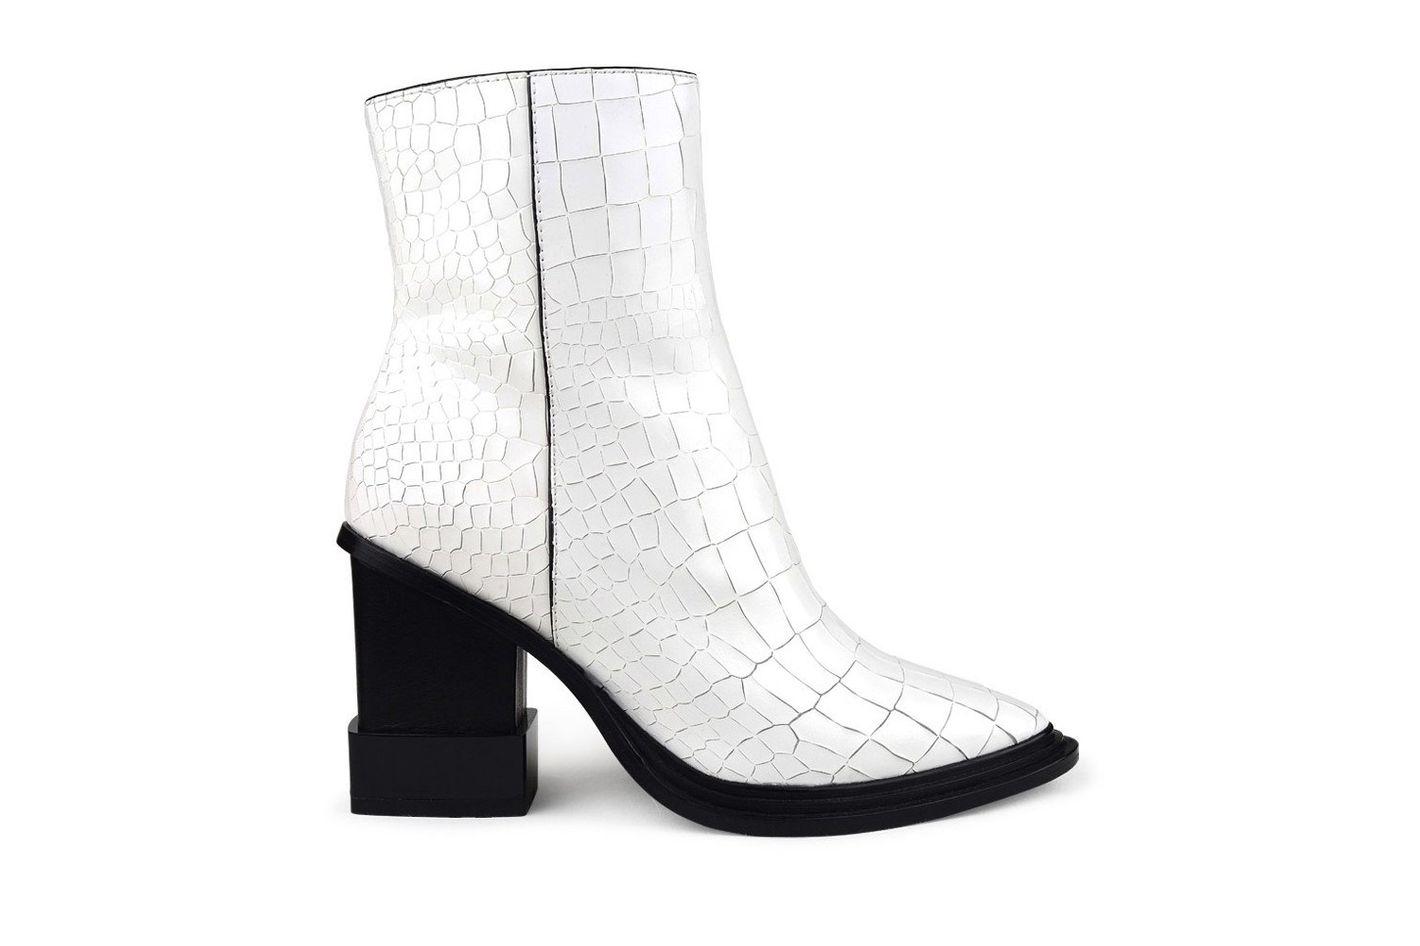 Kat Maconie 'Paloma' Croc Embossed Boots